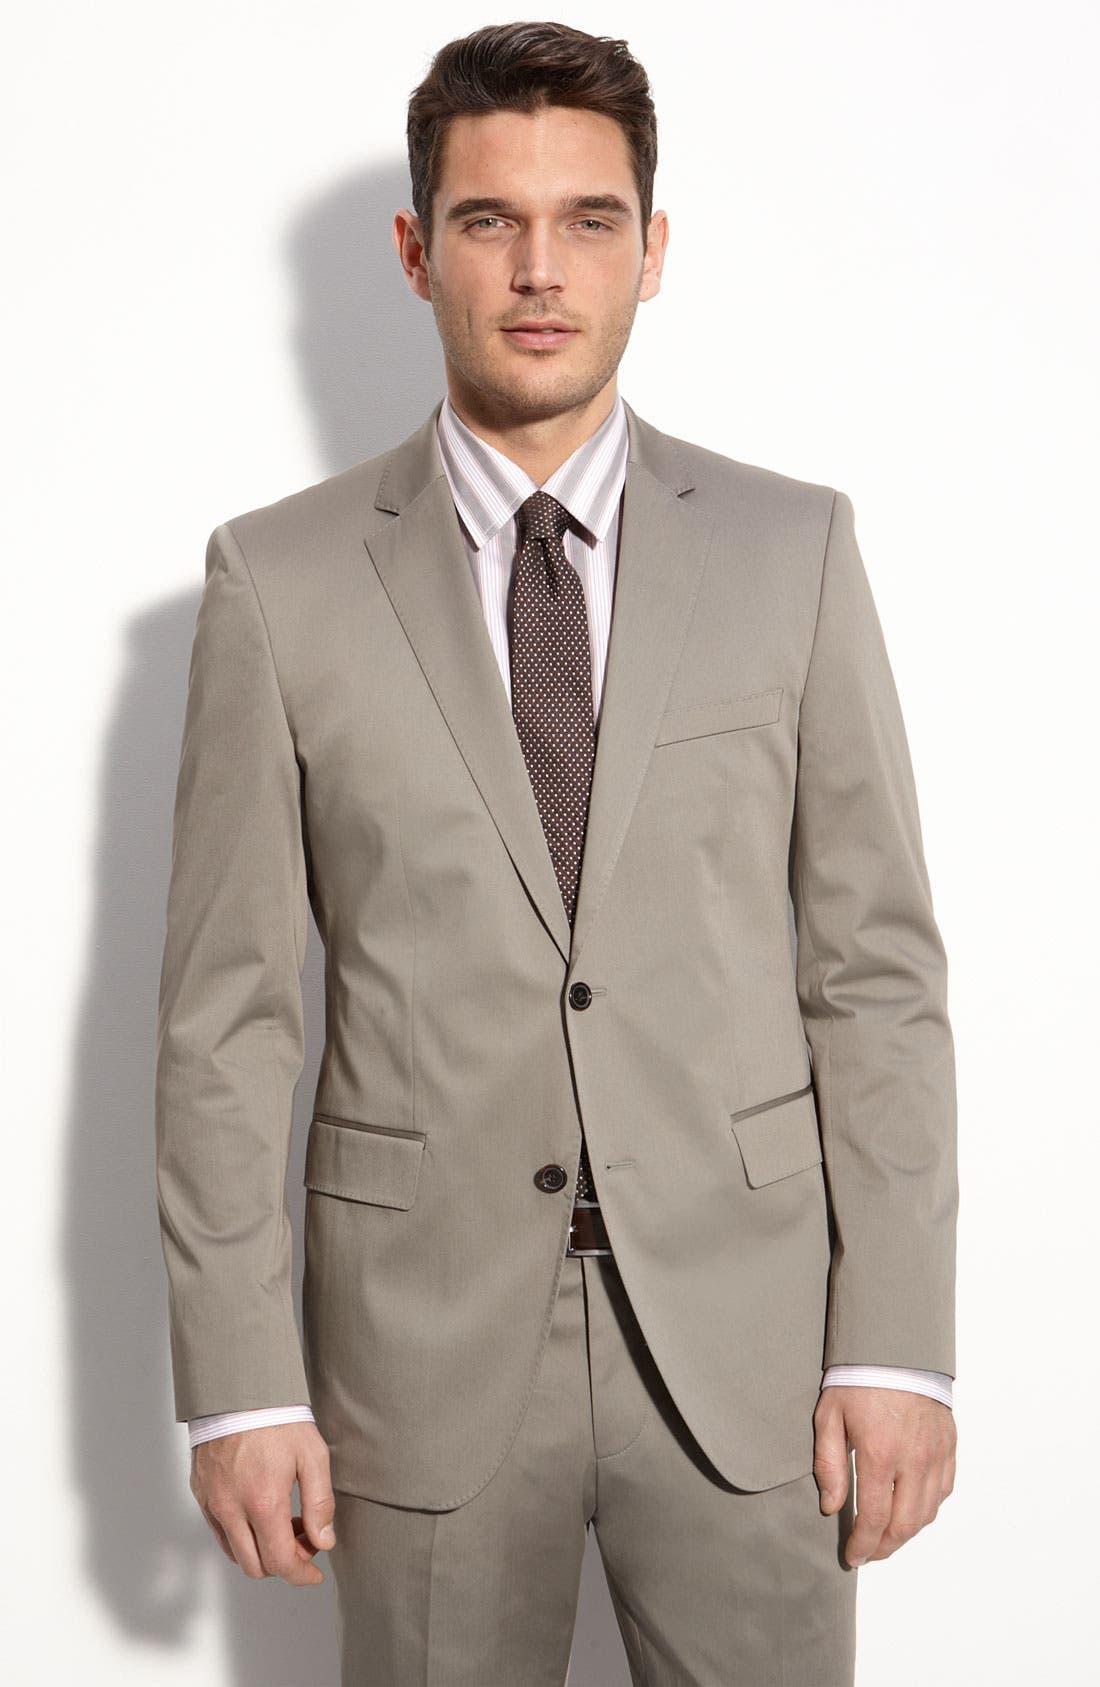 BOSS Black 'The James/Sharp 2' Grey Stretch Cotton Suit,                         Main,                         color, 031